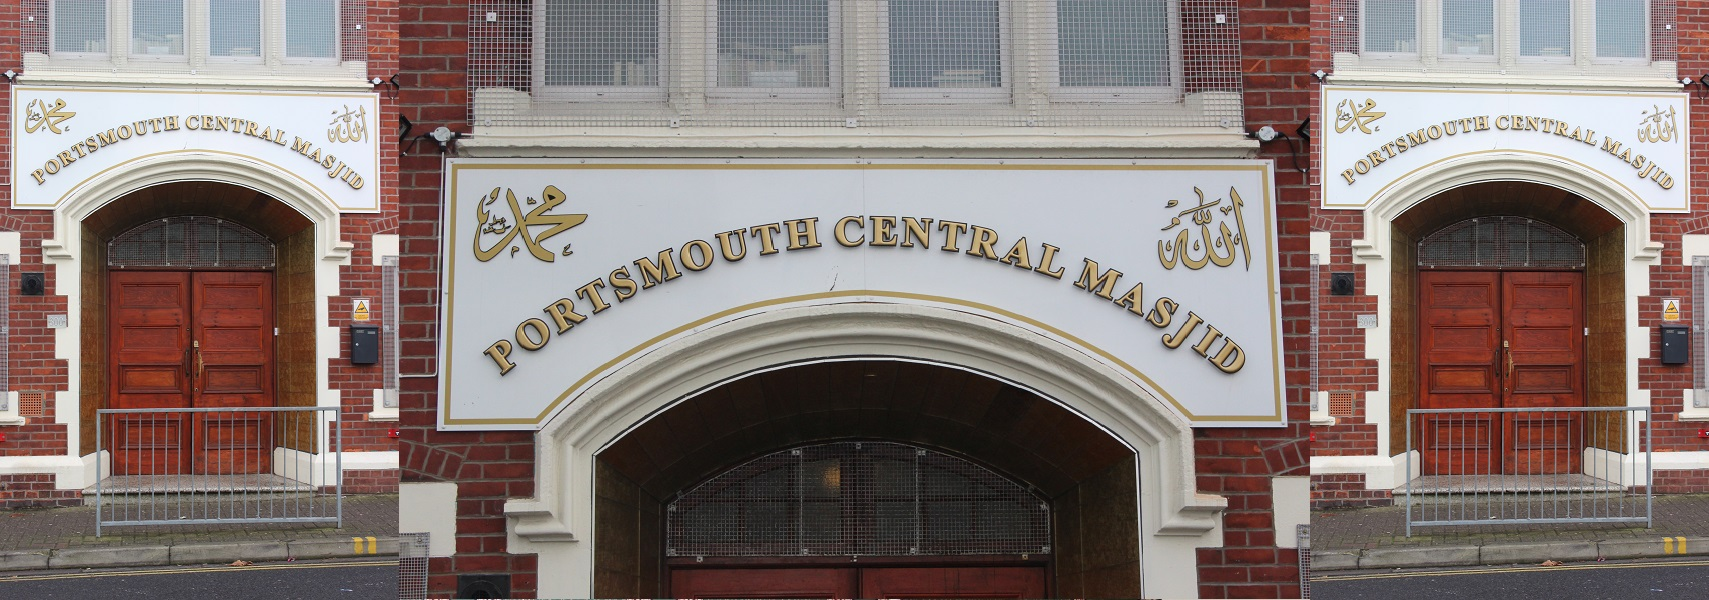 Portsmouth Central Masjid Album